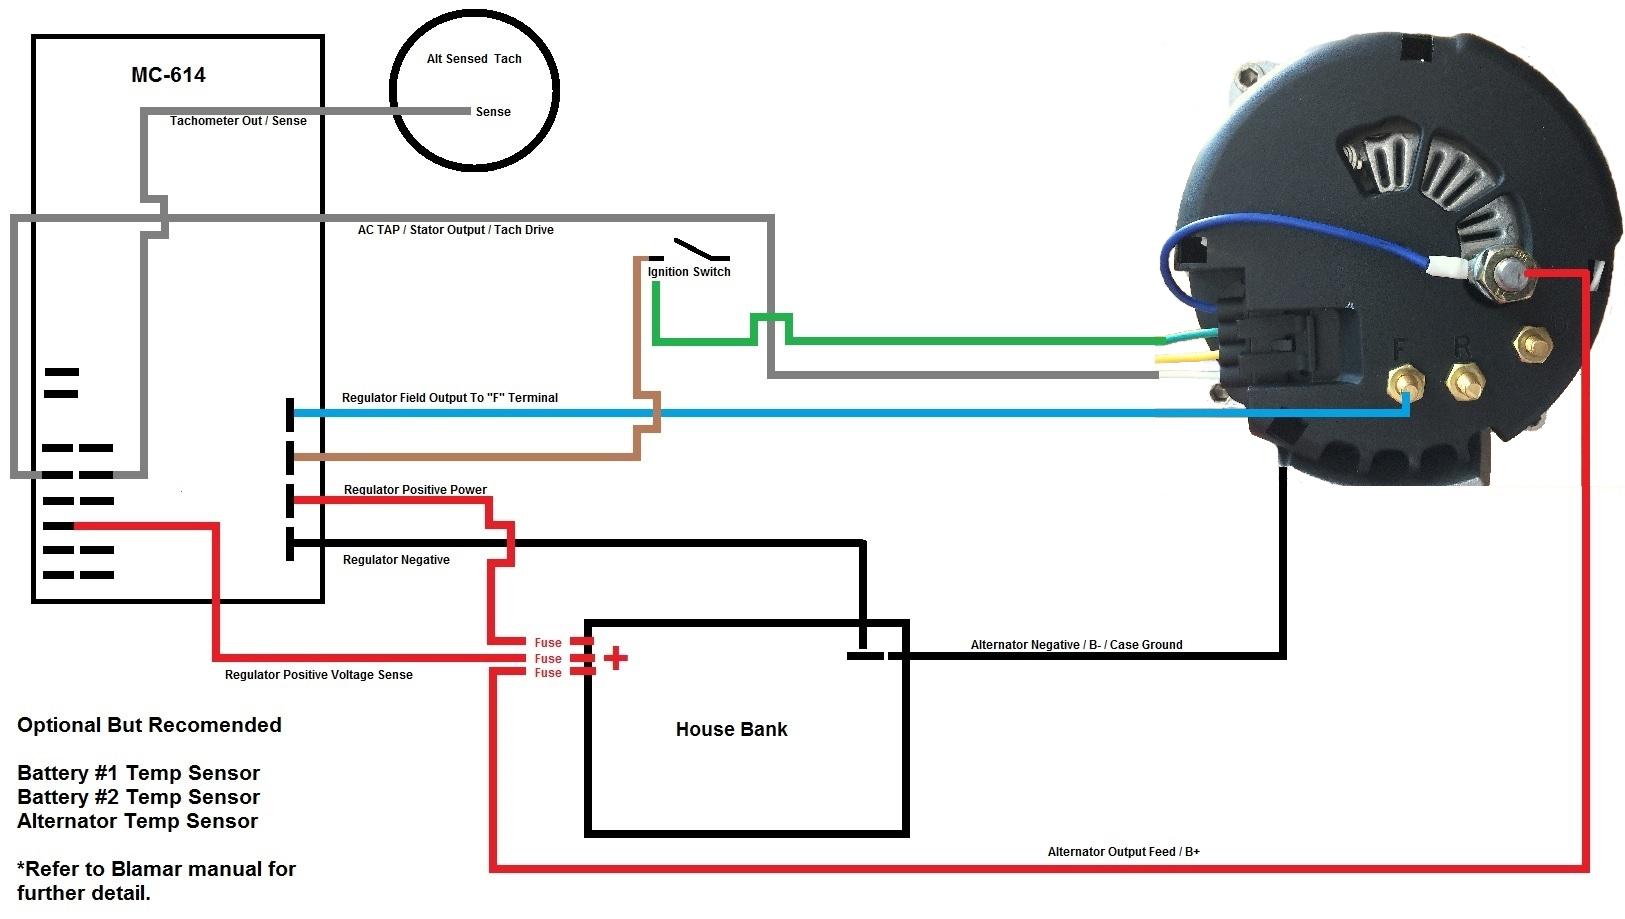 Wiring Diagram Balmar 6 Series Alternator Simple Auto Electrical Regulator 31 Images